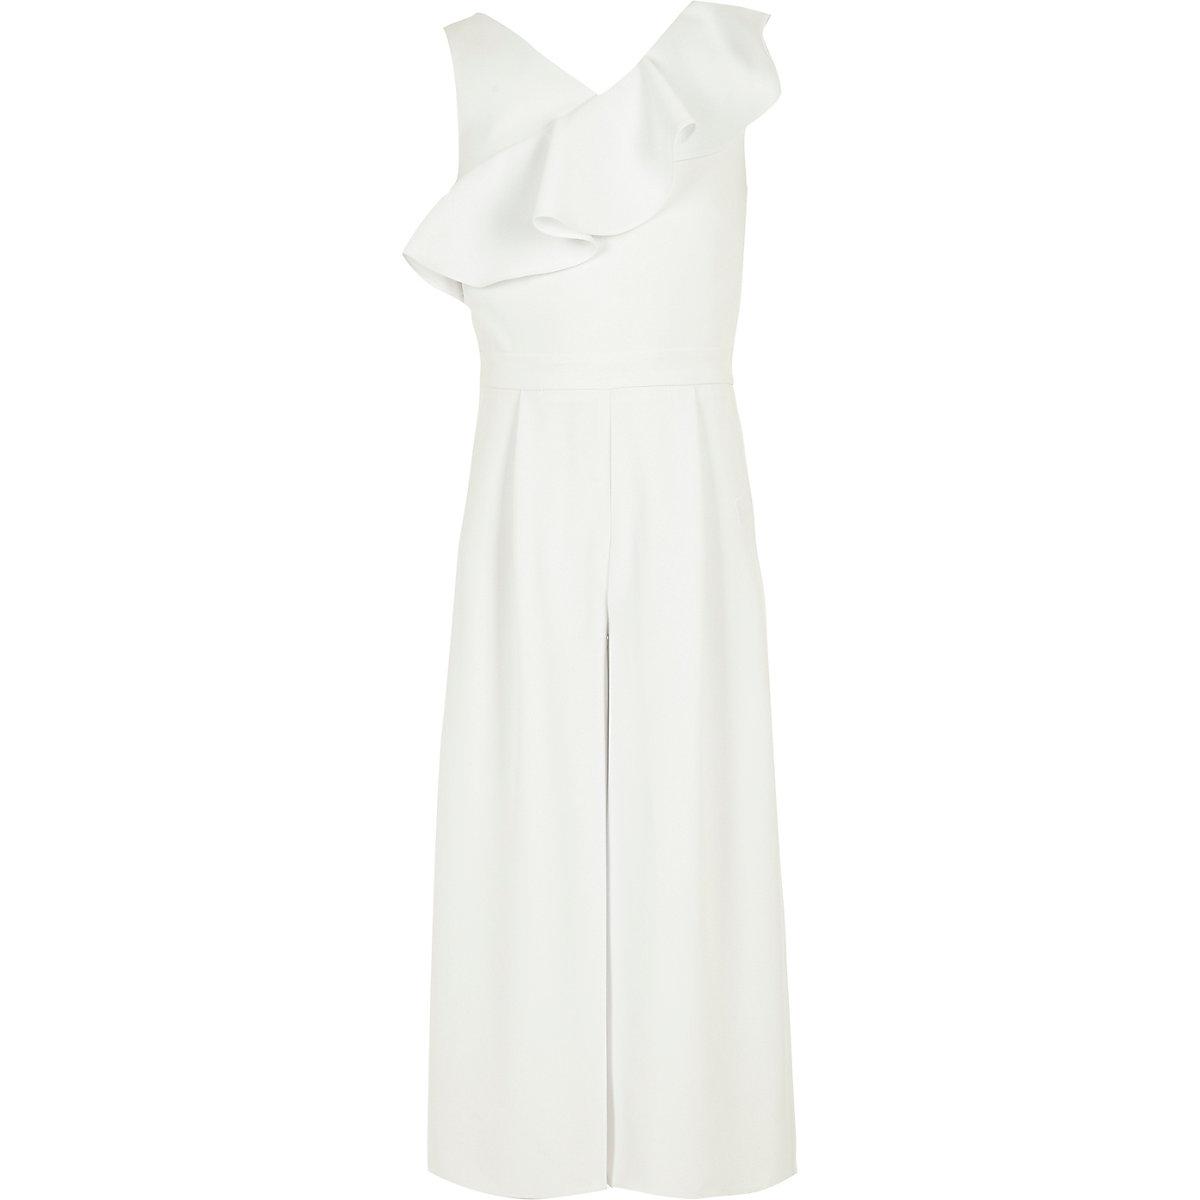 Girls white frill culotte jumpsuit